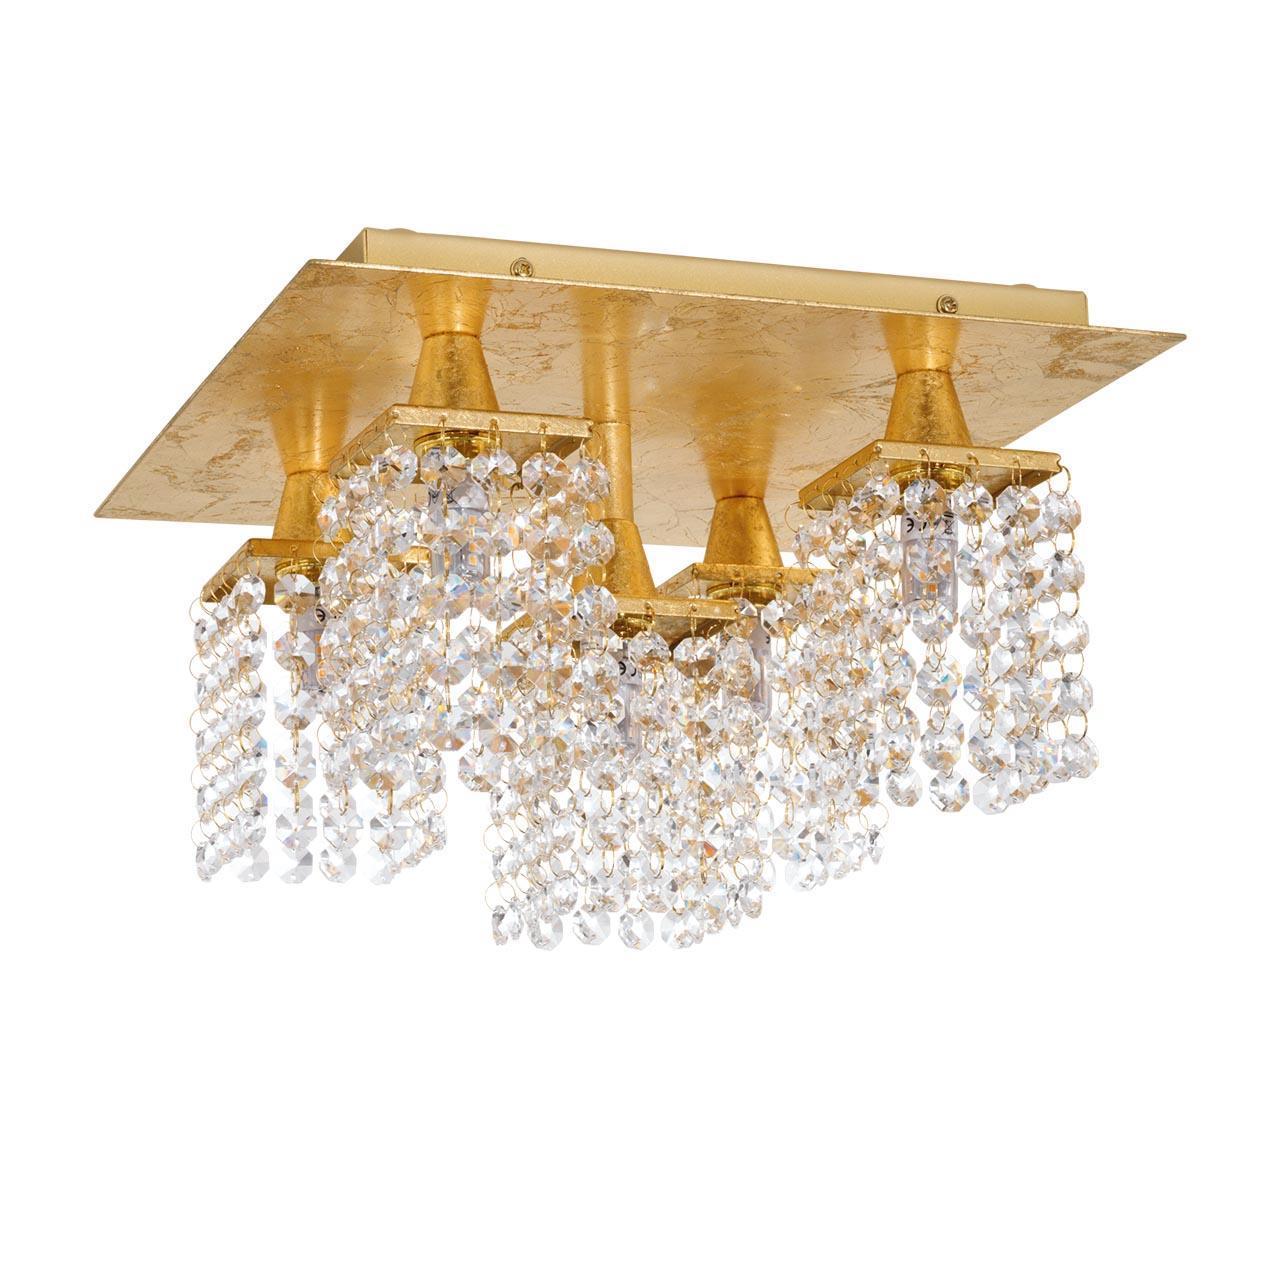 Потолочная люстра Eglo Pyton Gold 97721 цена 2017